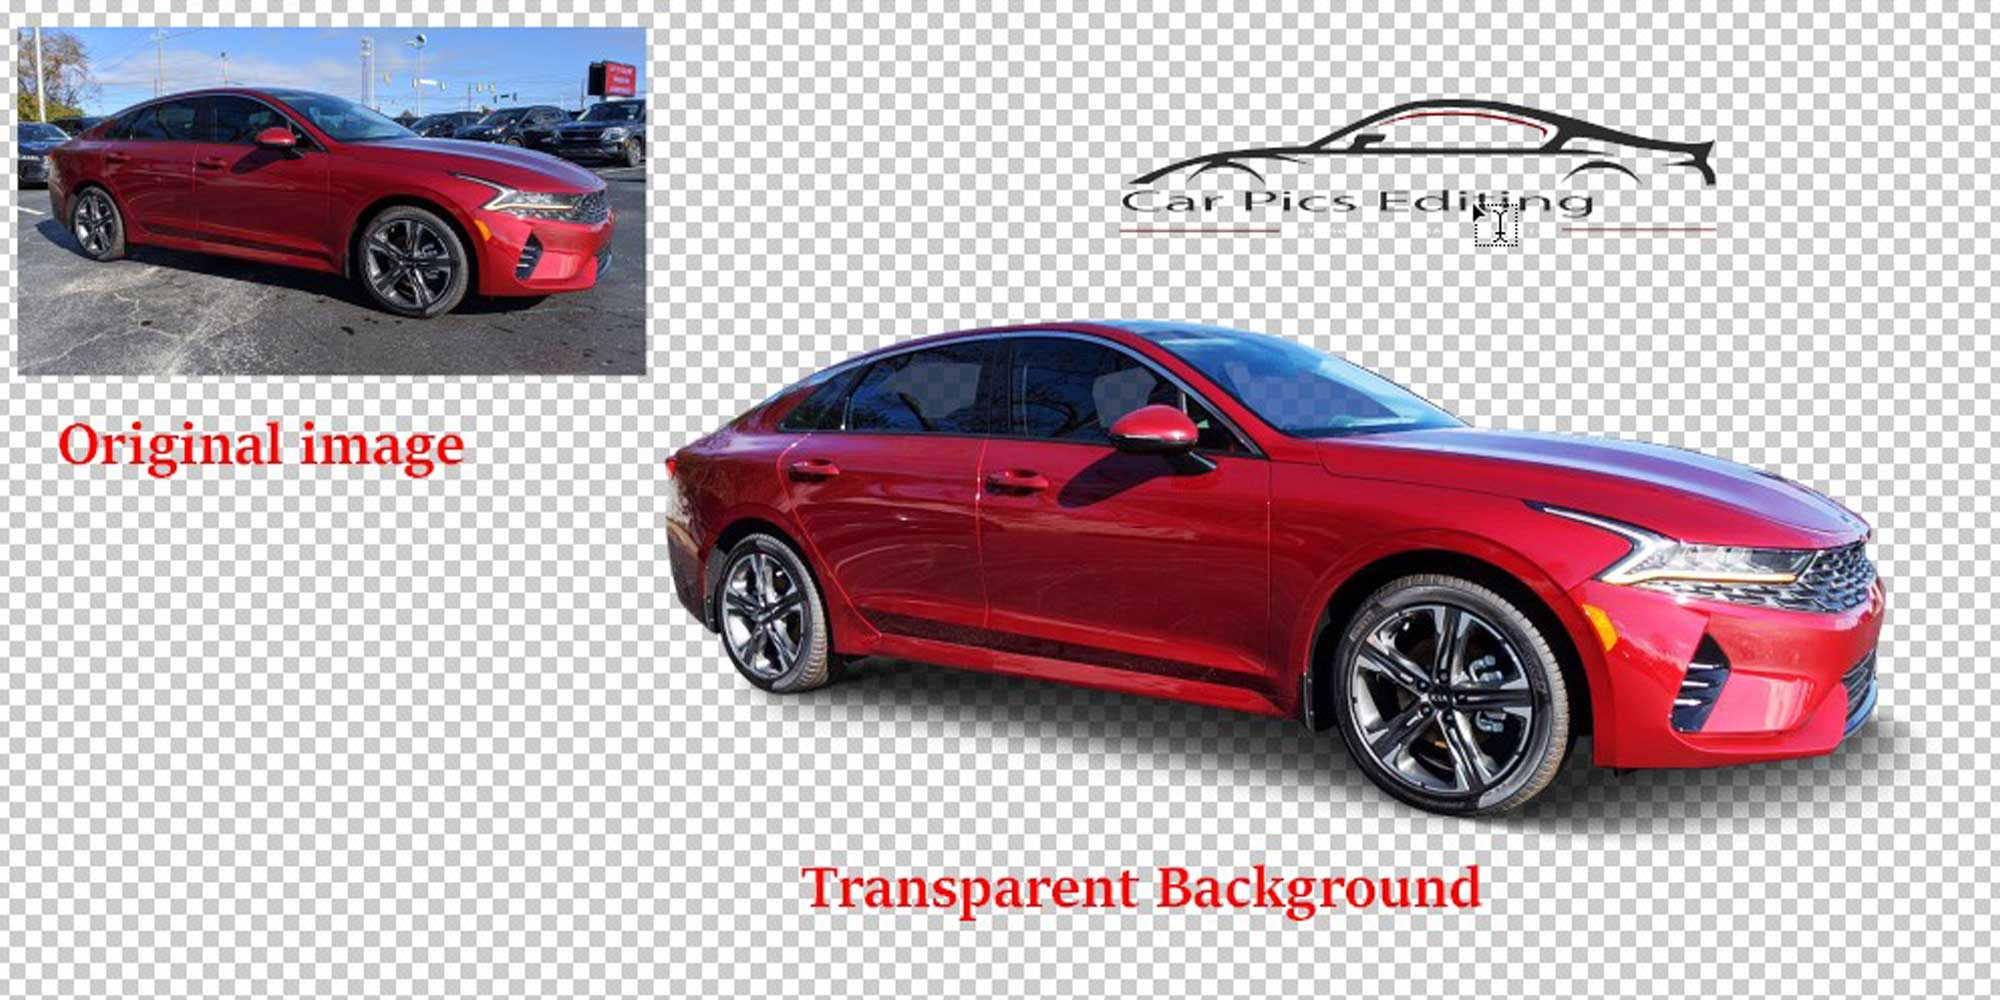 Car Transparent Background- Car Pics Editing